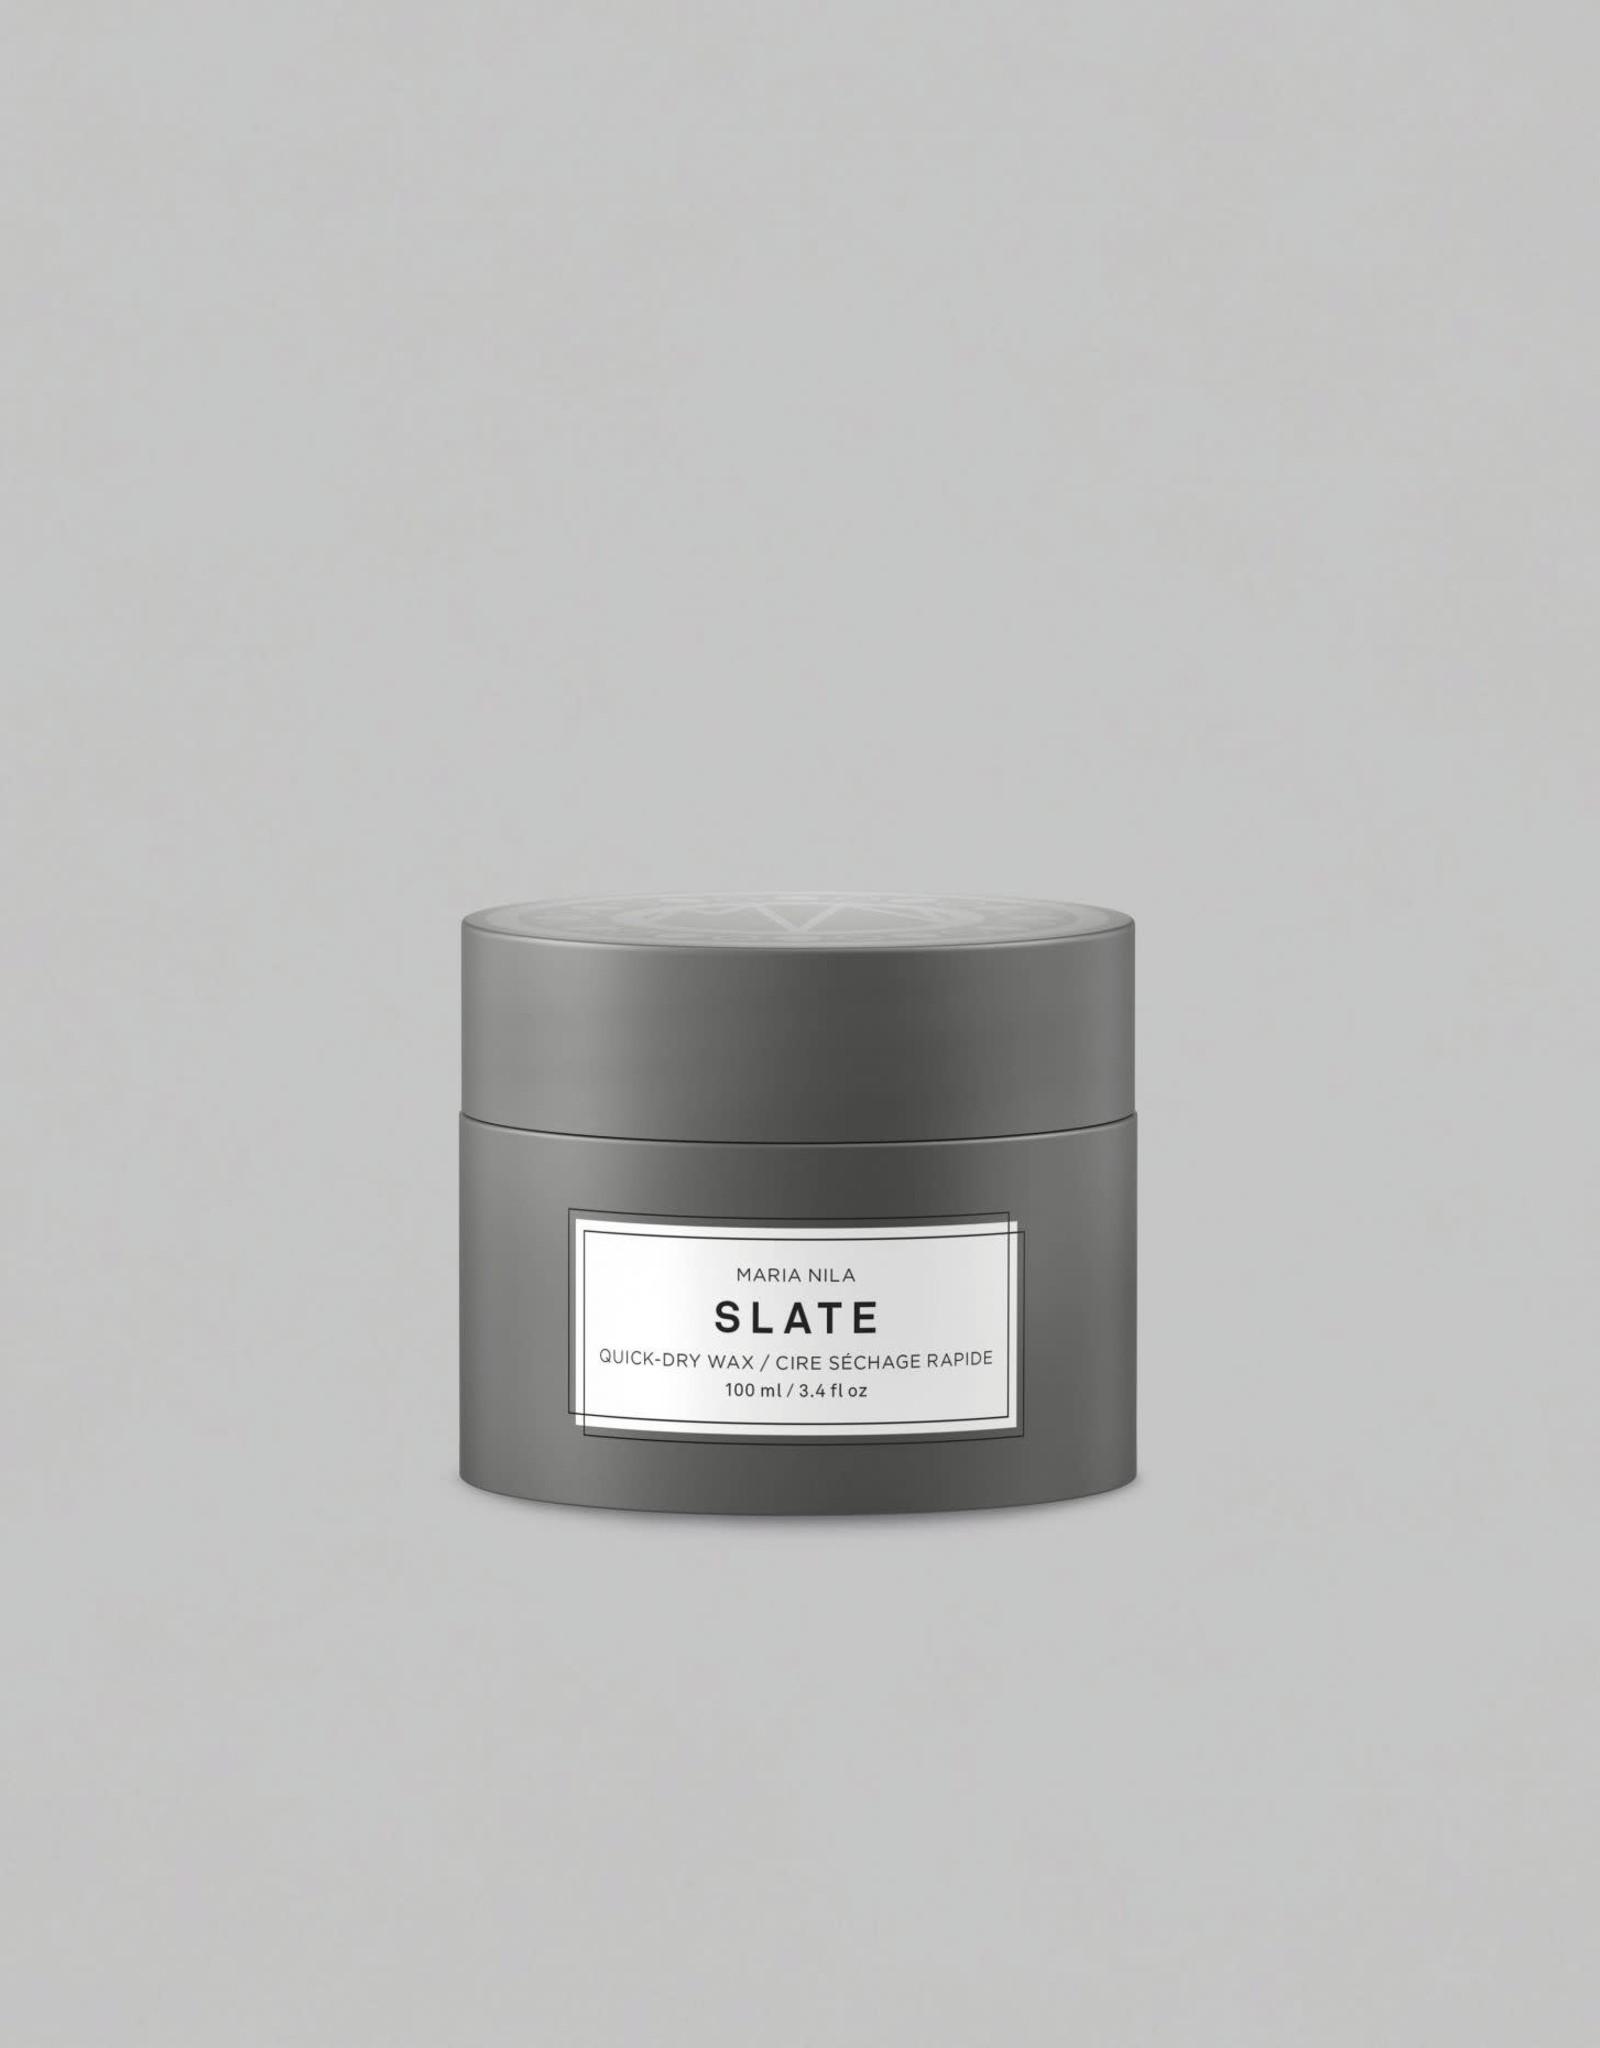 Maria Nila Slate Quick-Dry Wax 100ml